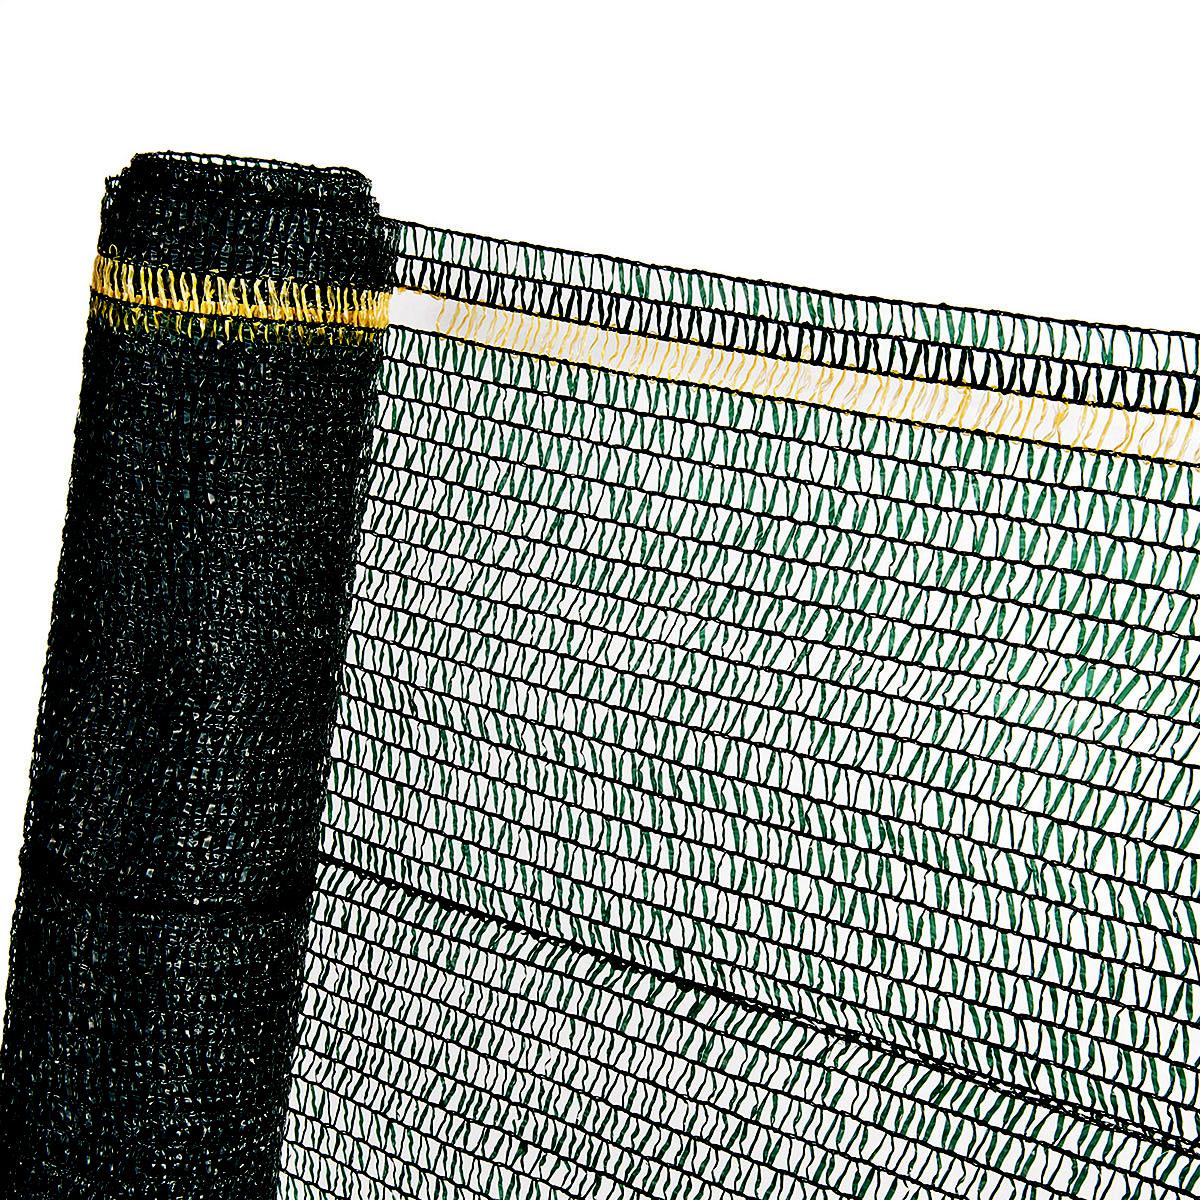 maulwurfnetz maulwurfsperre maulwurfbek mpfung netz haga. Black Bedroom Furniture Sets. Home Design Ideas